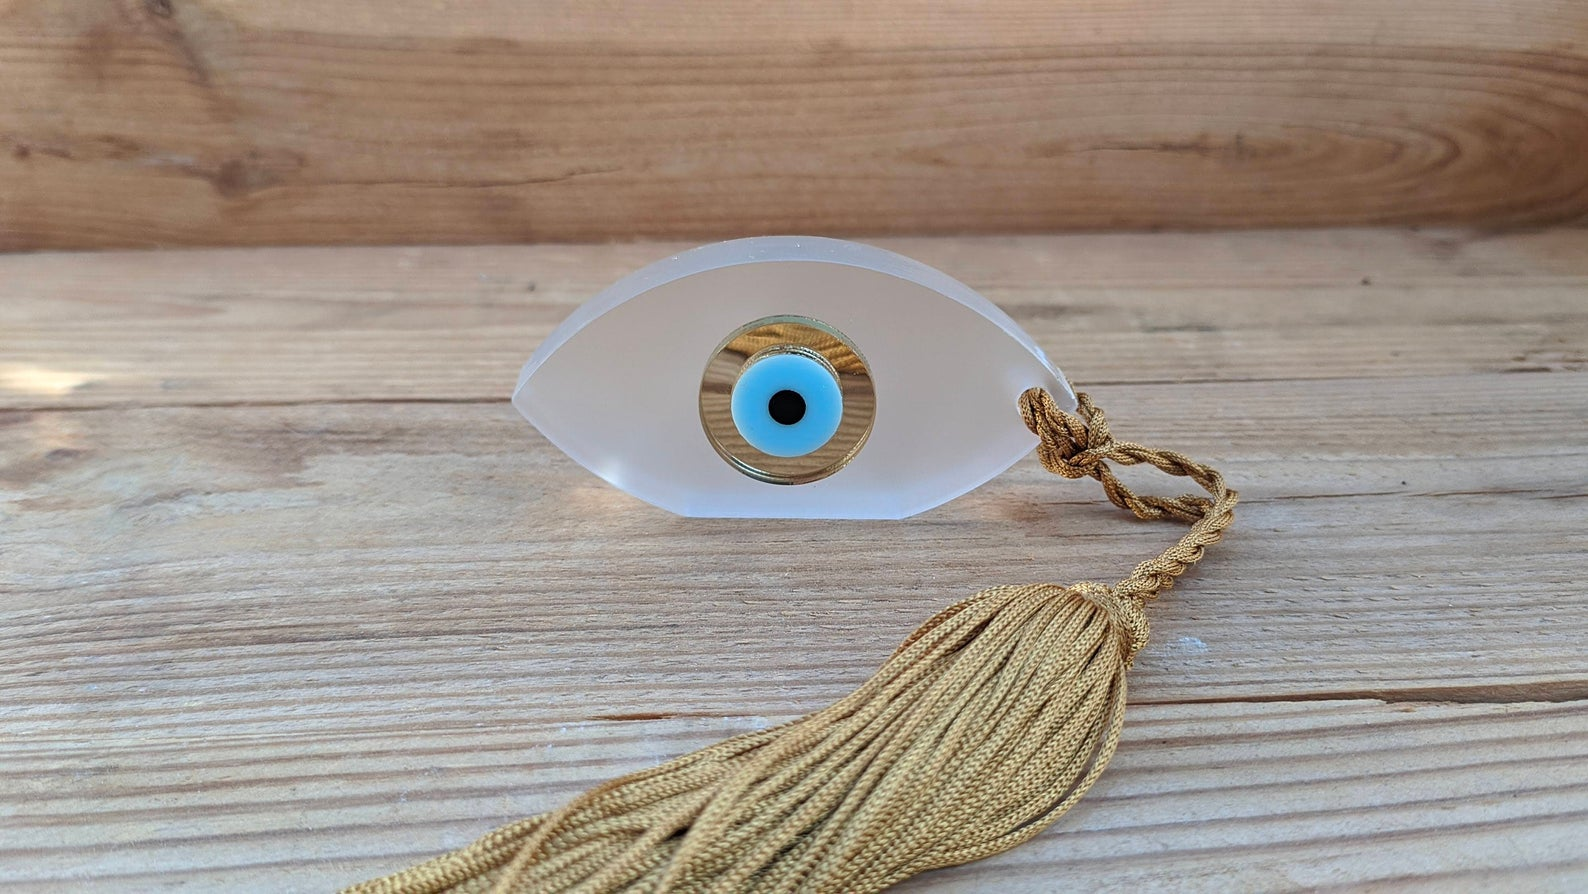 evil eye house ornament